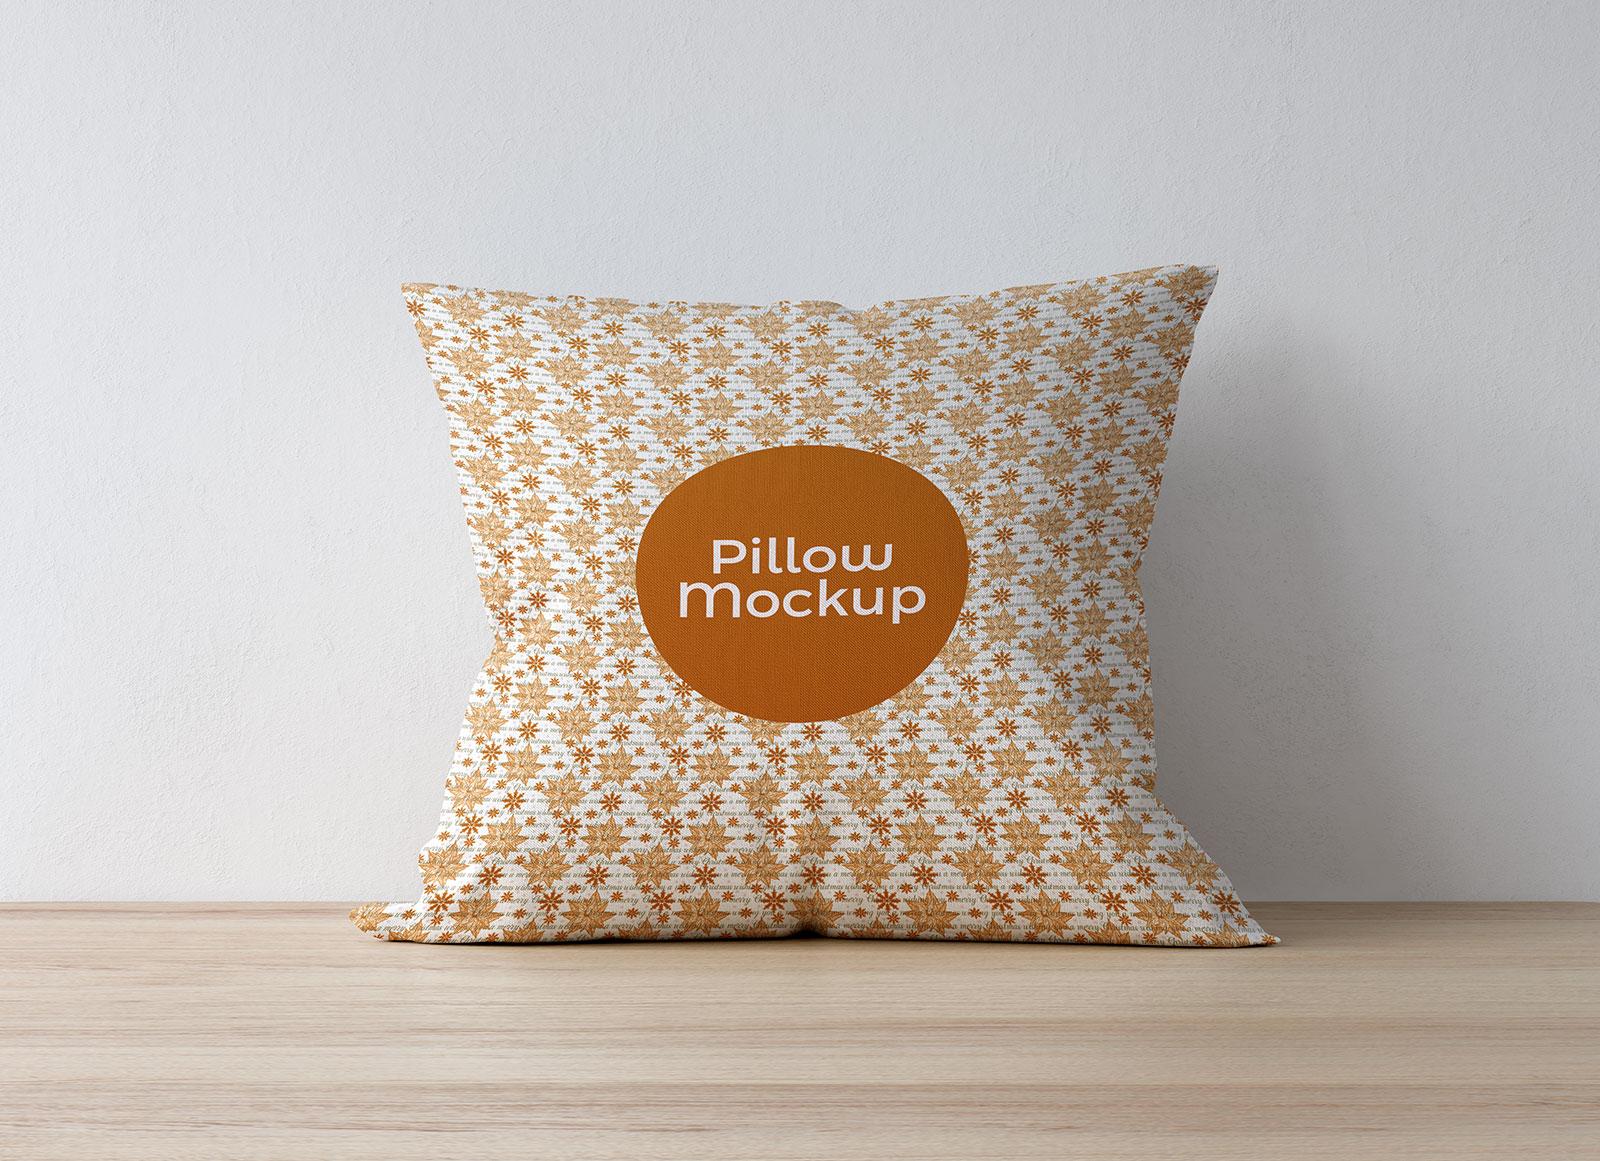 Free-Premium-Quality-Square-Pillow-Cushion-Mockup-PSD